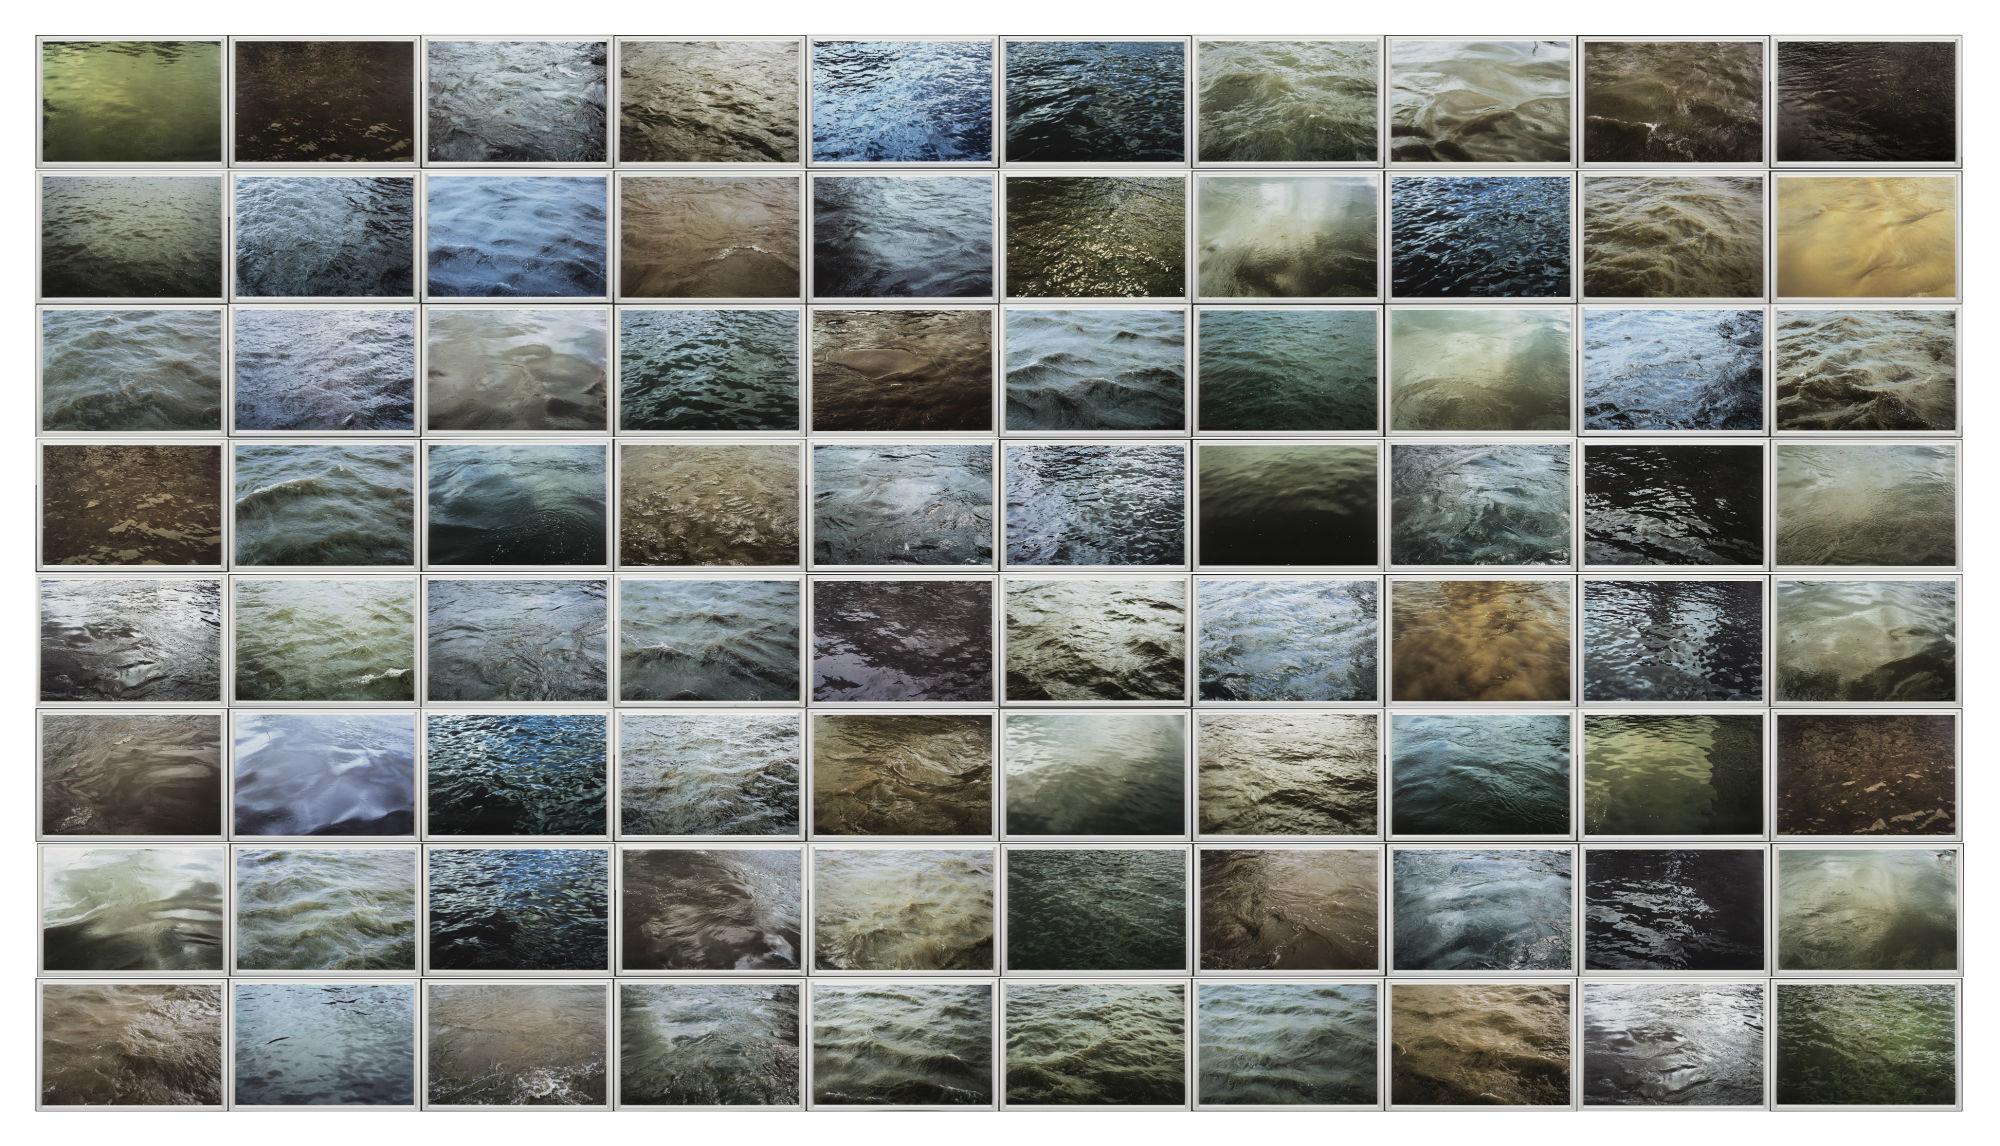 Roni Horn, Some Thames, 2000